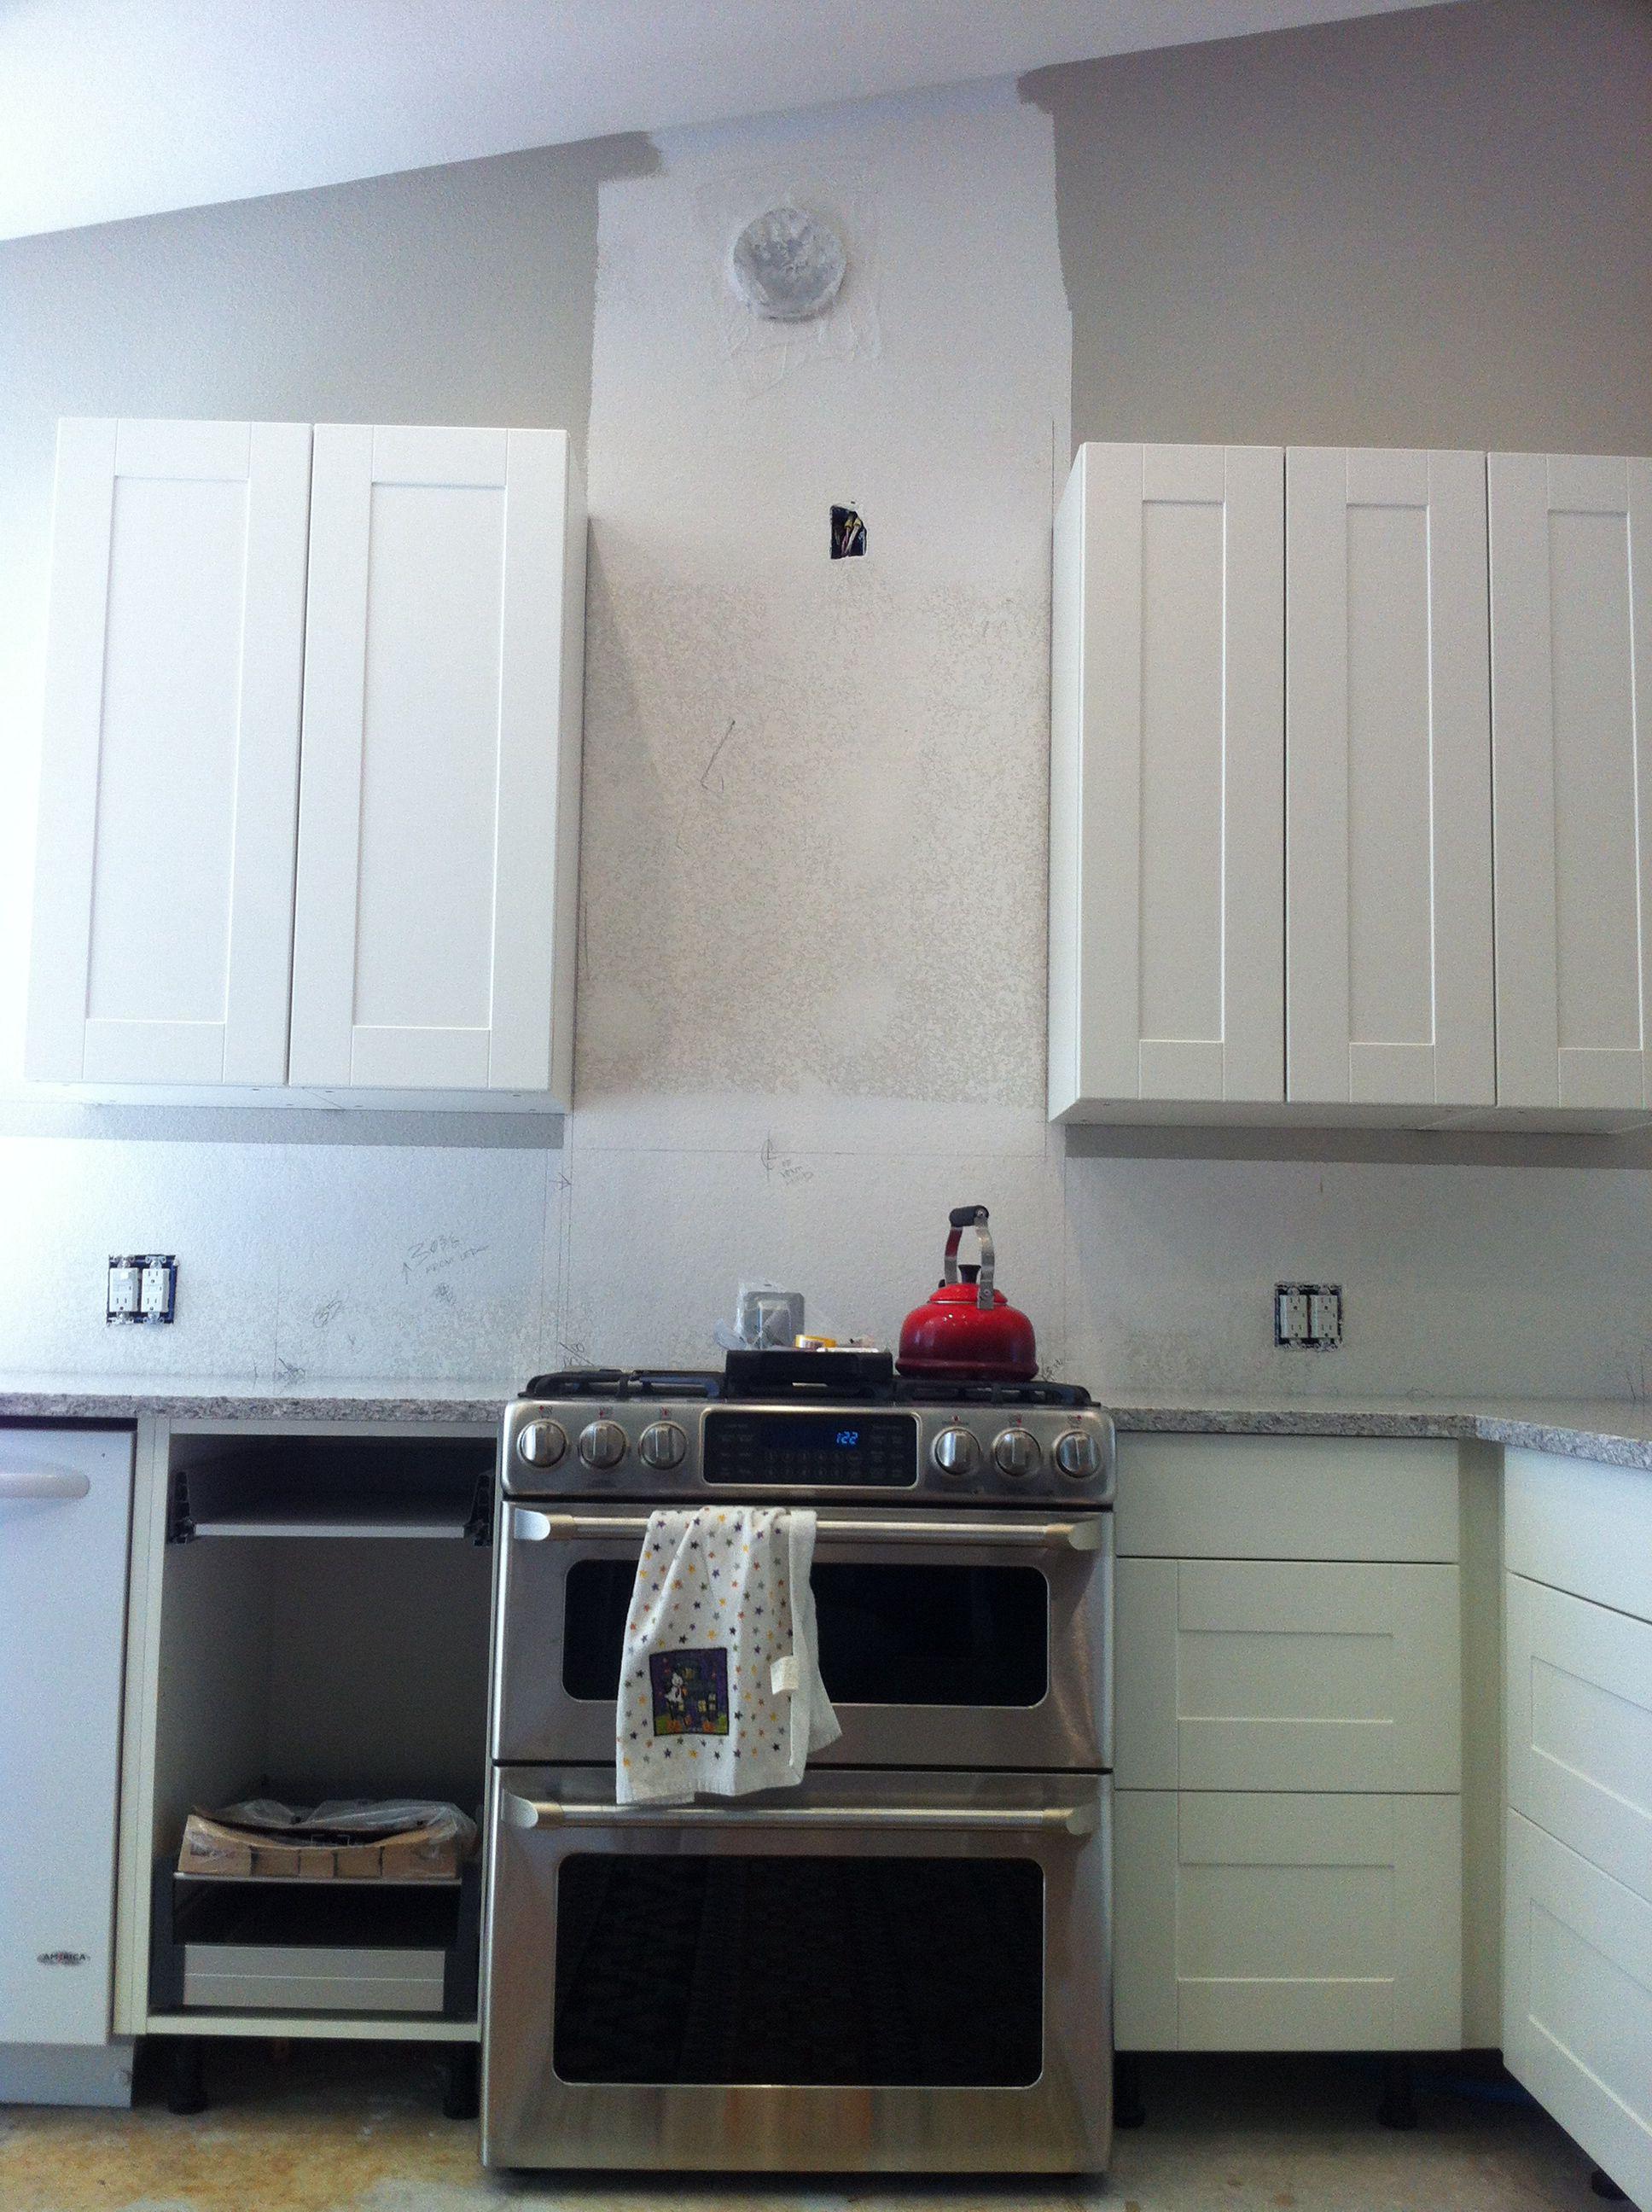 ikea cabinets with ge cafe double oven range. beveled subway tile